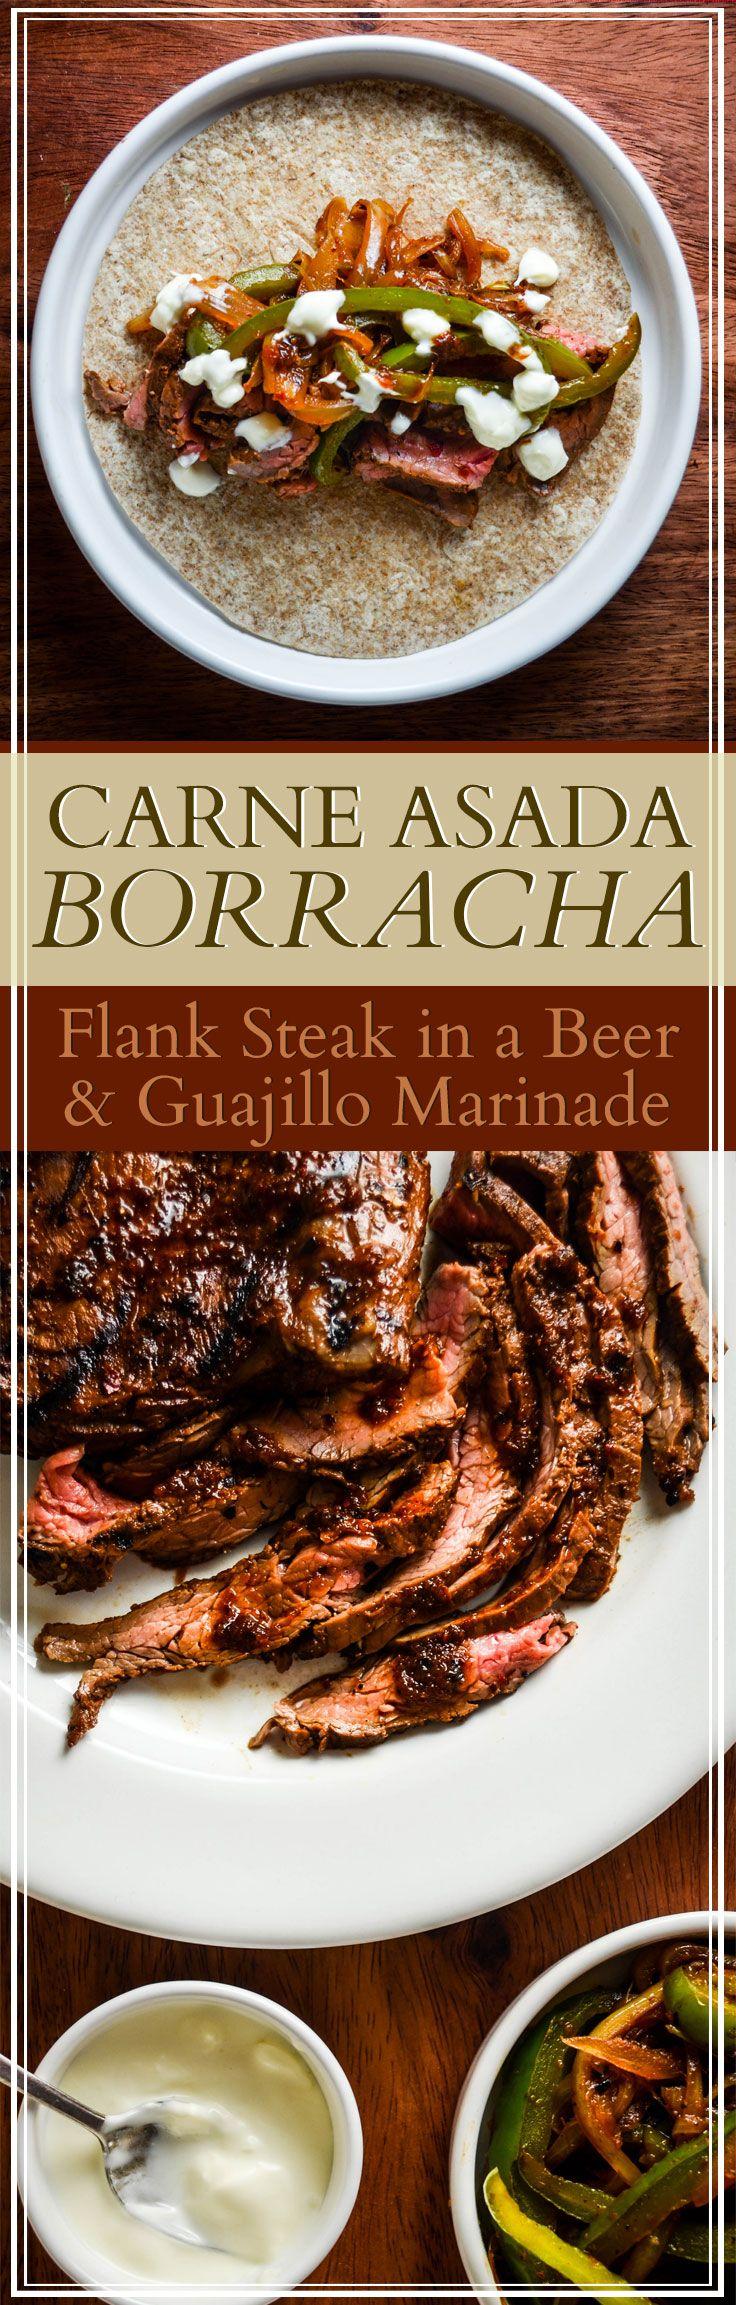 Carne Asada Borracha - Mexican flank steak in a beer and guajillo chili marinade.